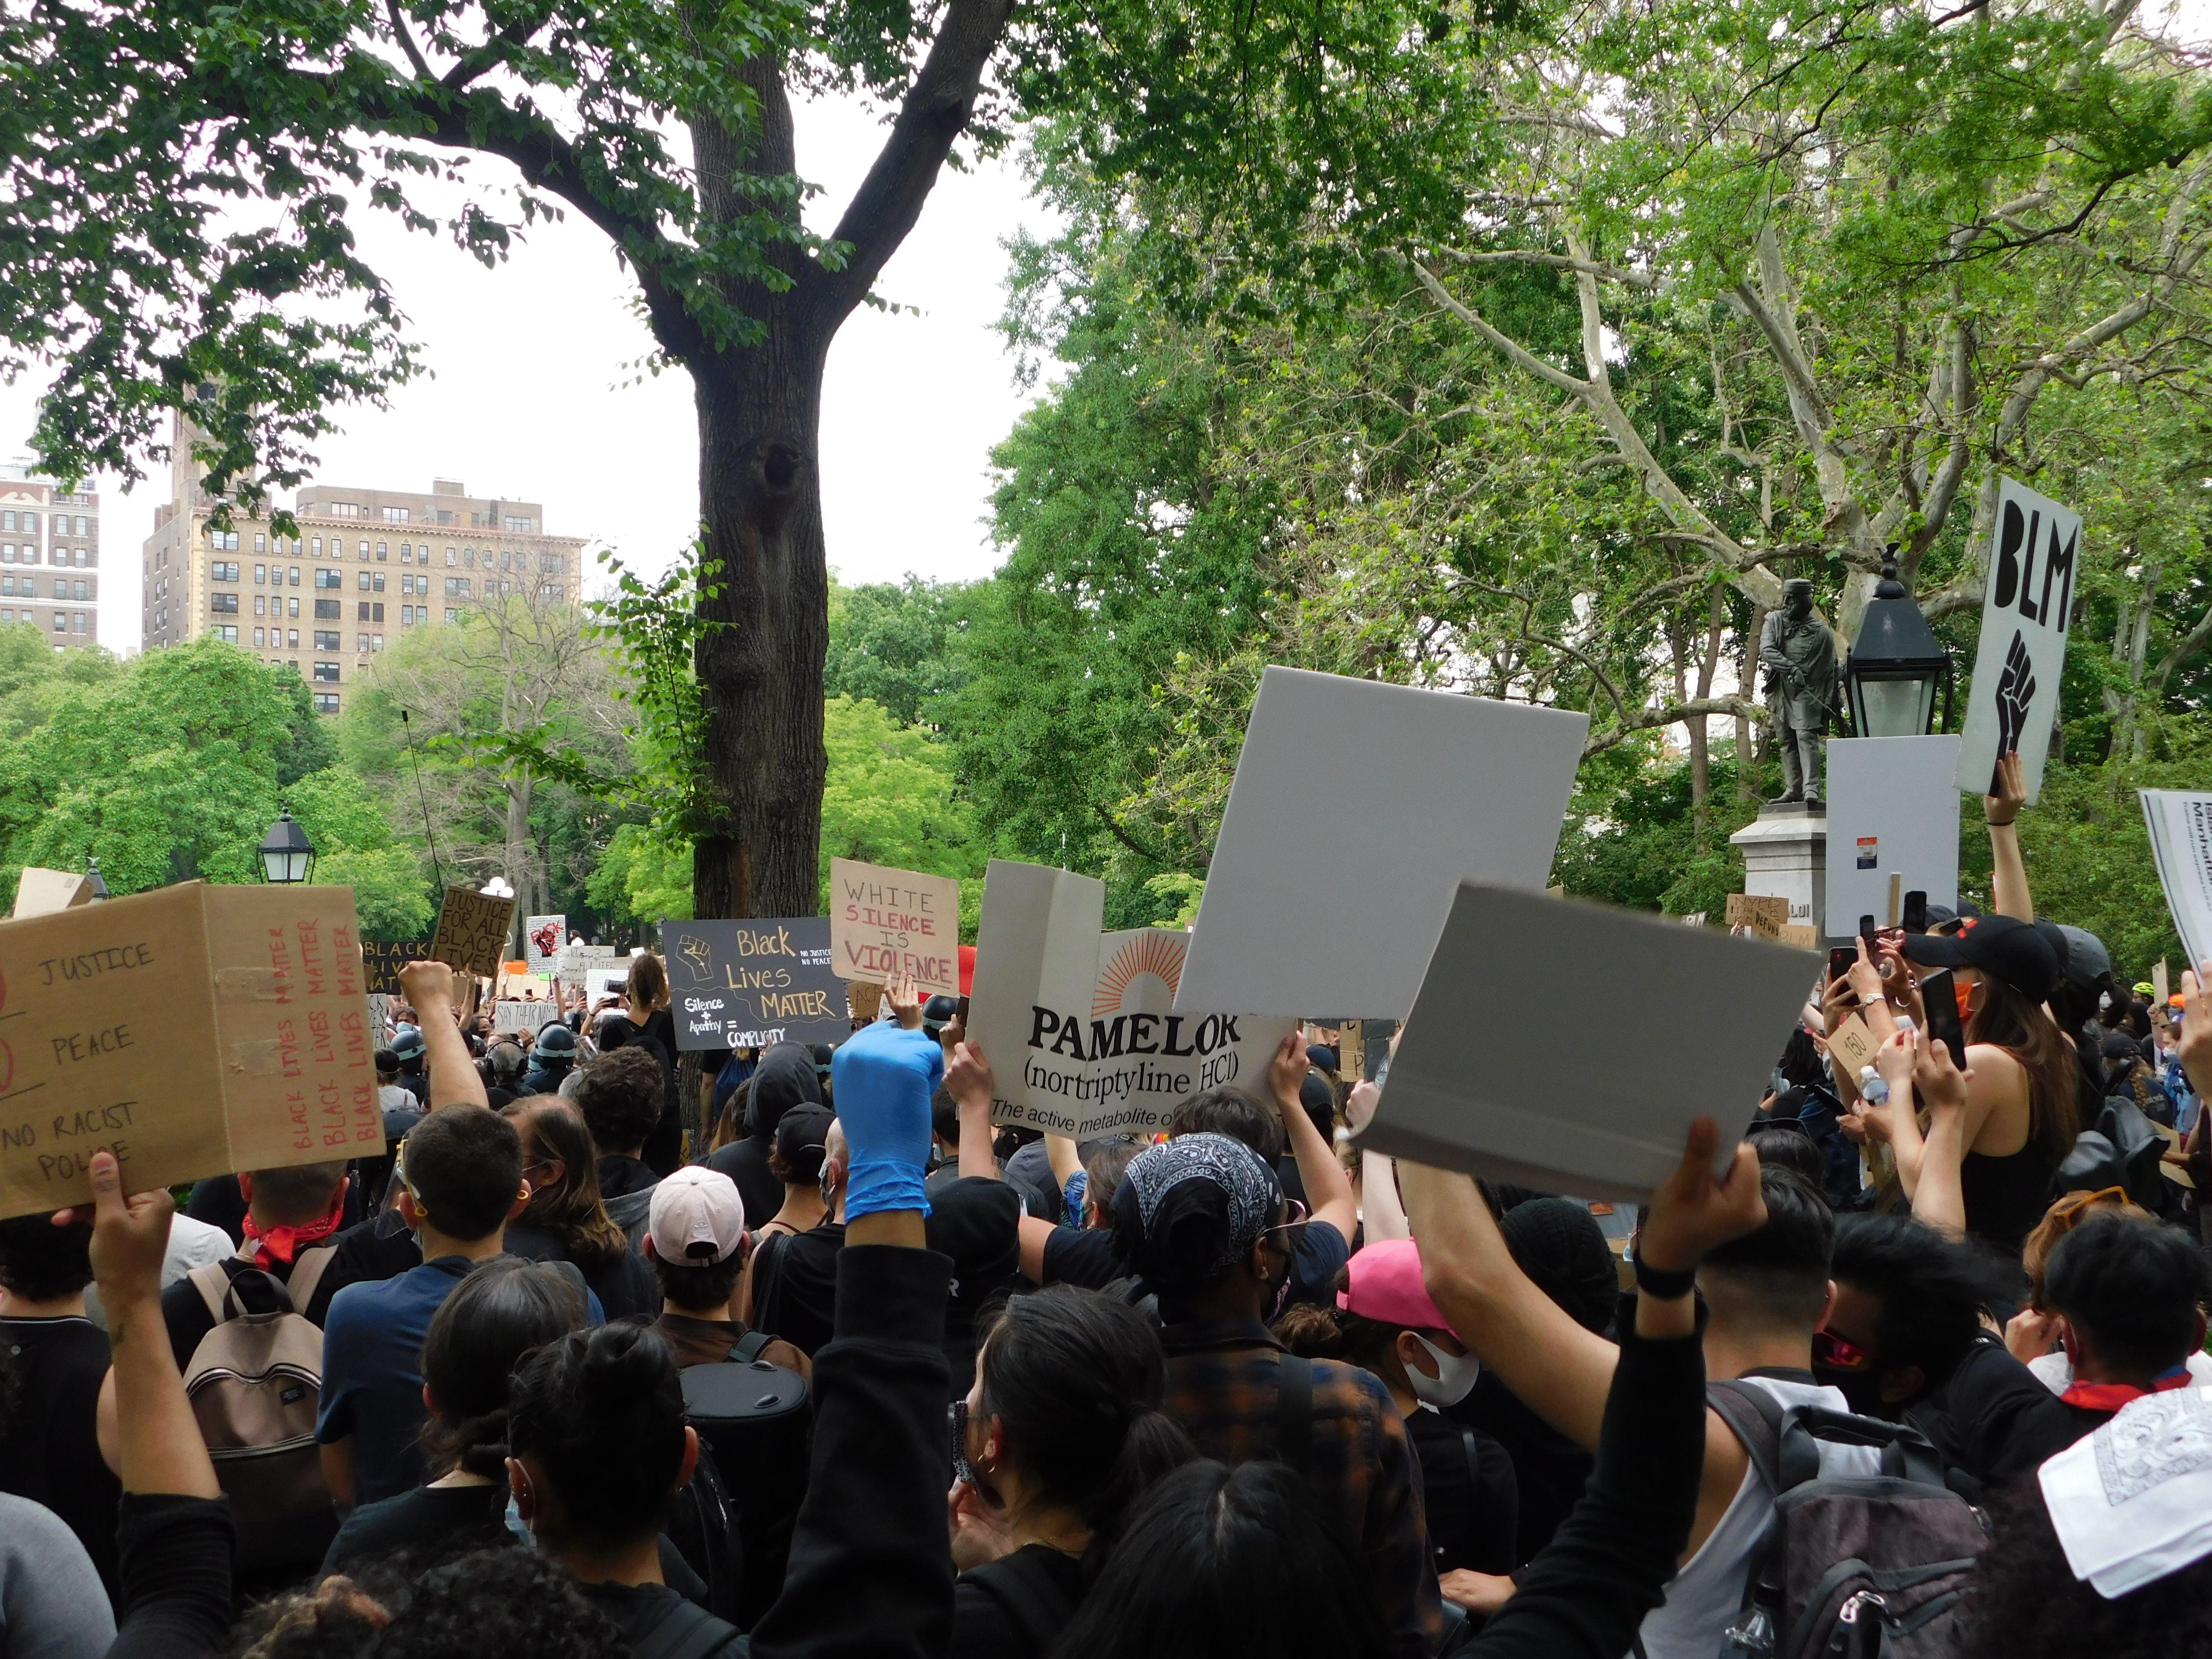 Washington Square Park New York City Blm Protest Black Lives Matter Protest Washington Square Park Black Lives Matter